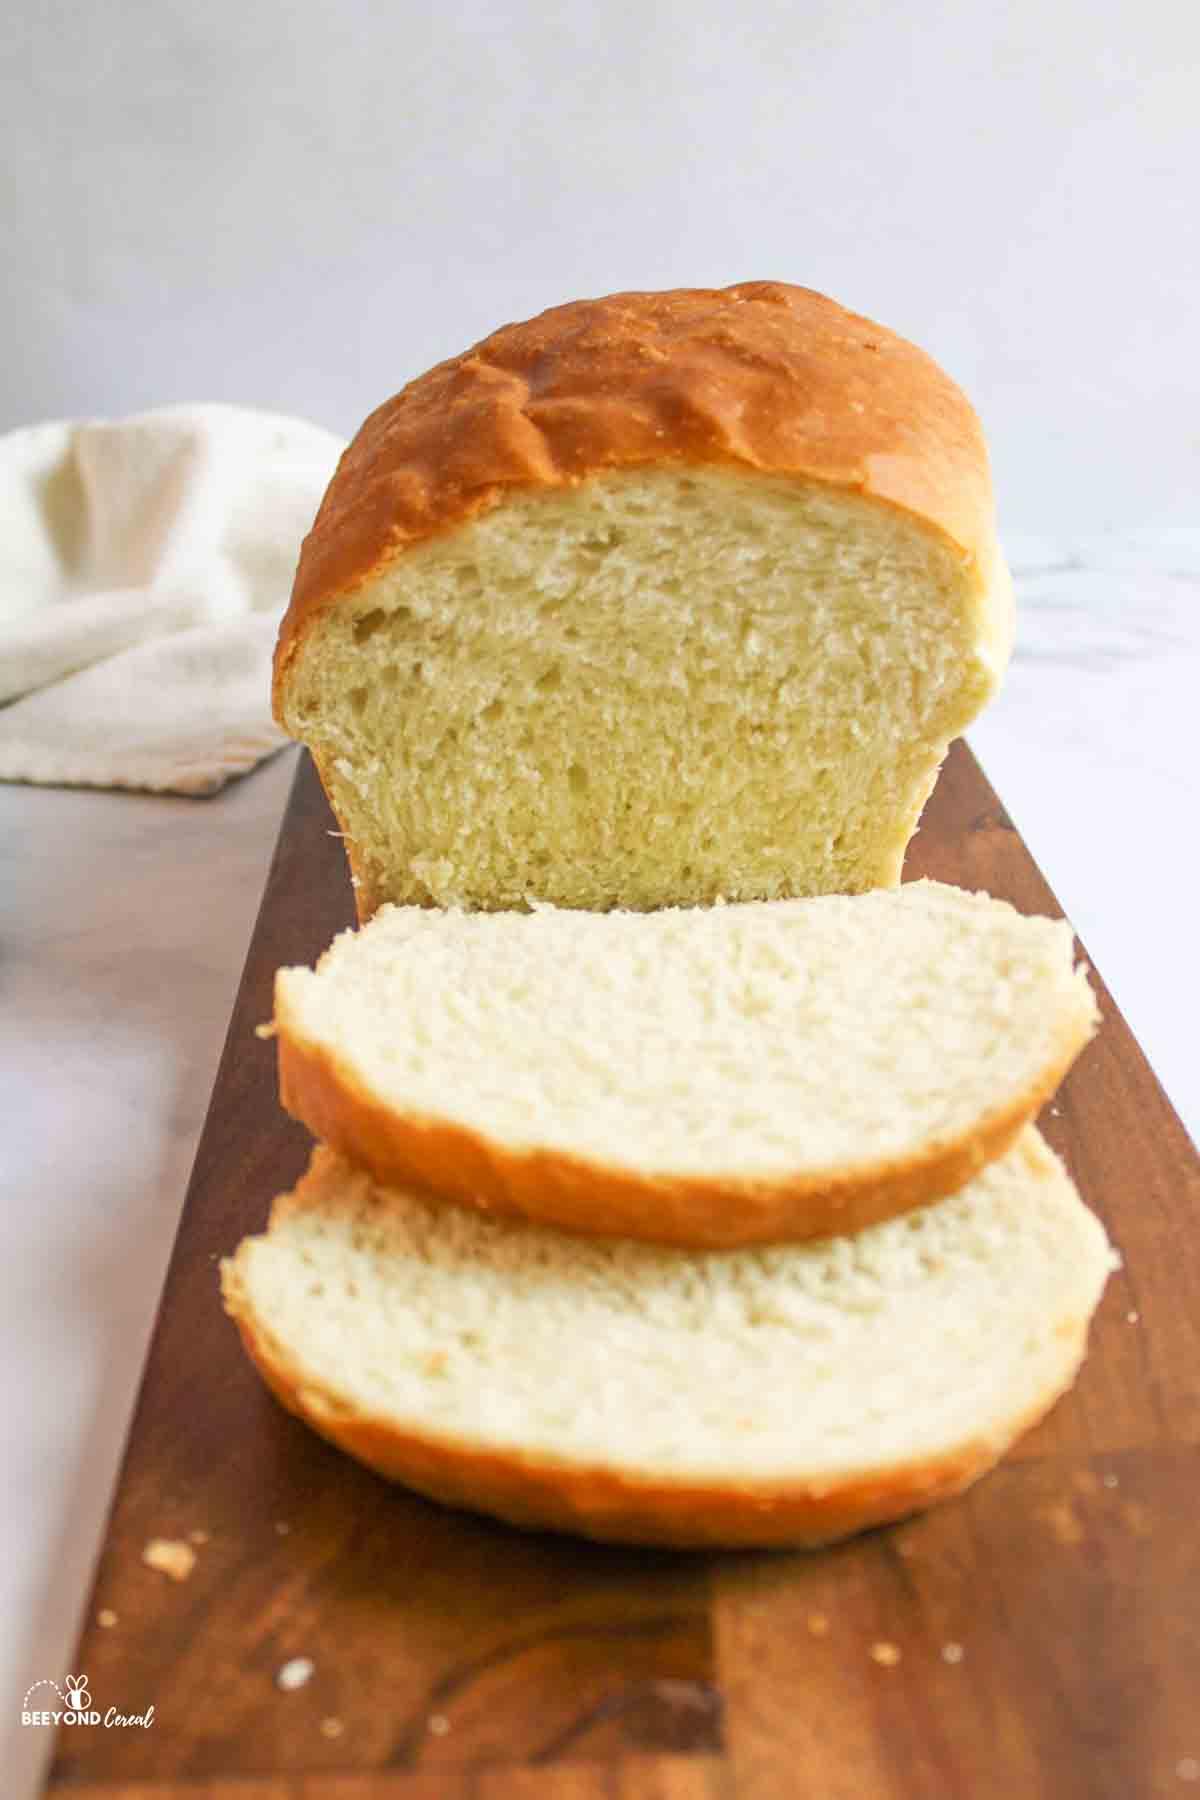 a sliced loaf of white bread on a dark wood cutting board